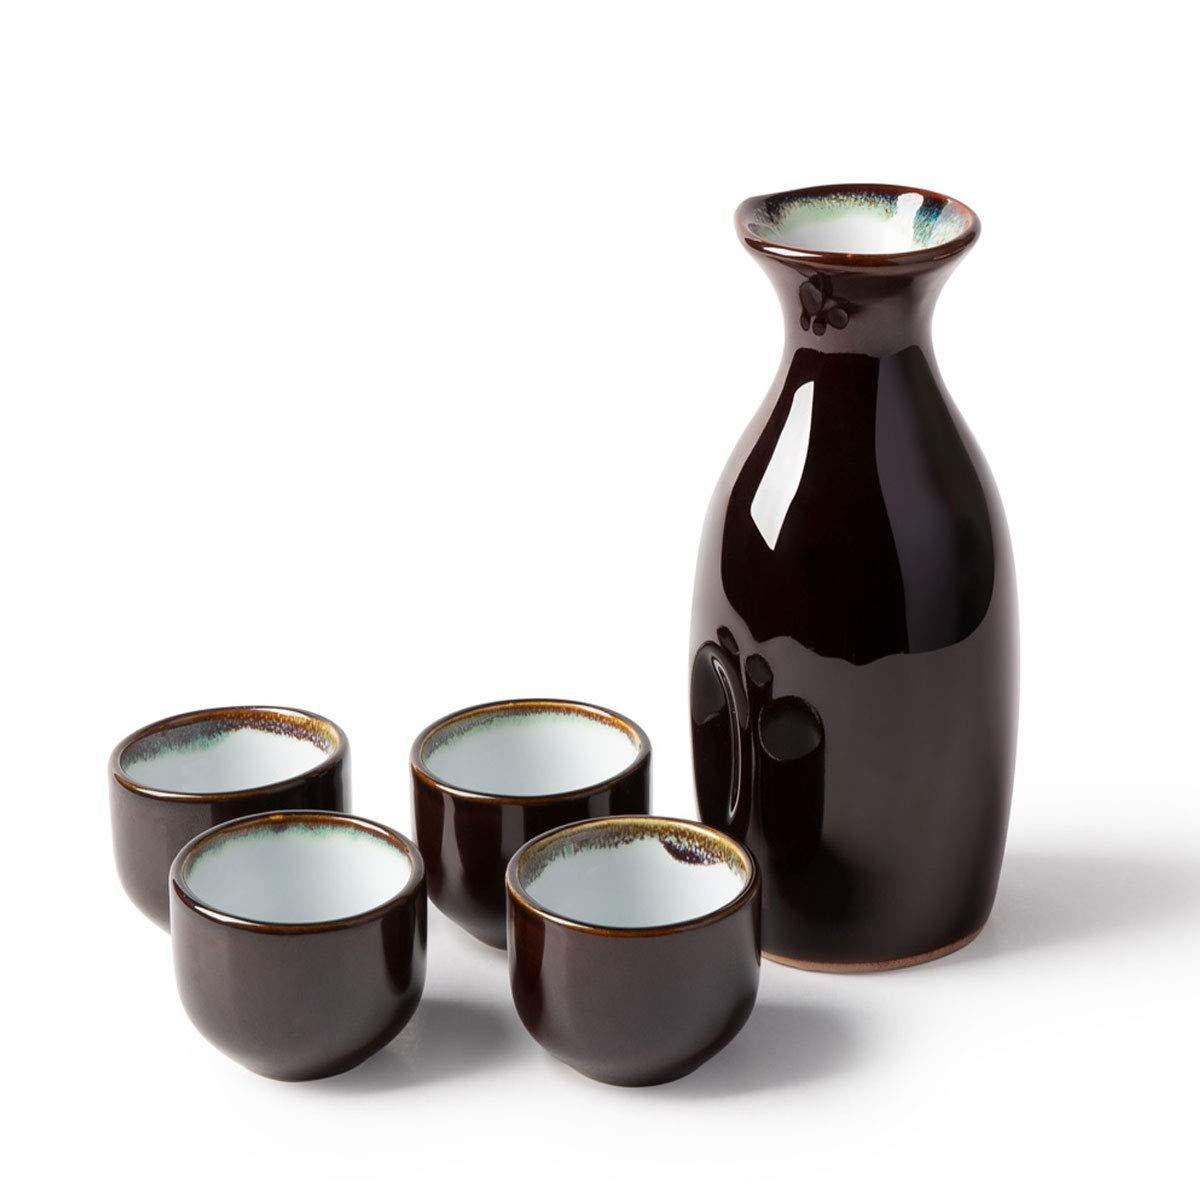 KBNI 5-Piece Japanese Sake Set Sky Blue Rim include 1PC Sake bottle and 4PCS Sake Cups